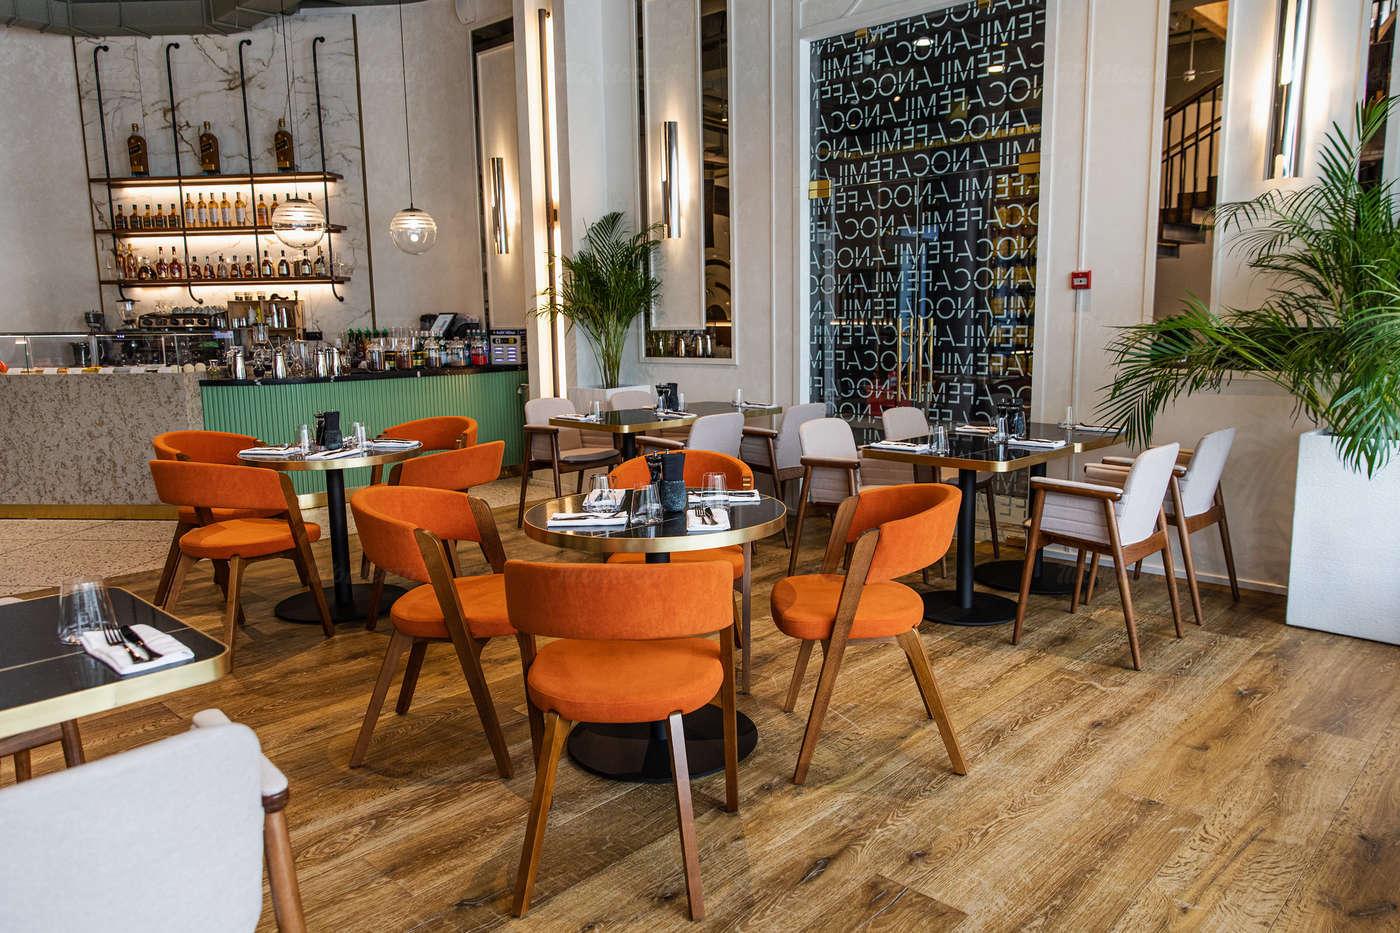 Ресторан Cafe Milano (Милано) на Новом Арбате фото 4